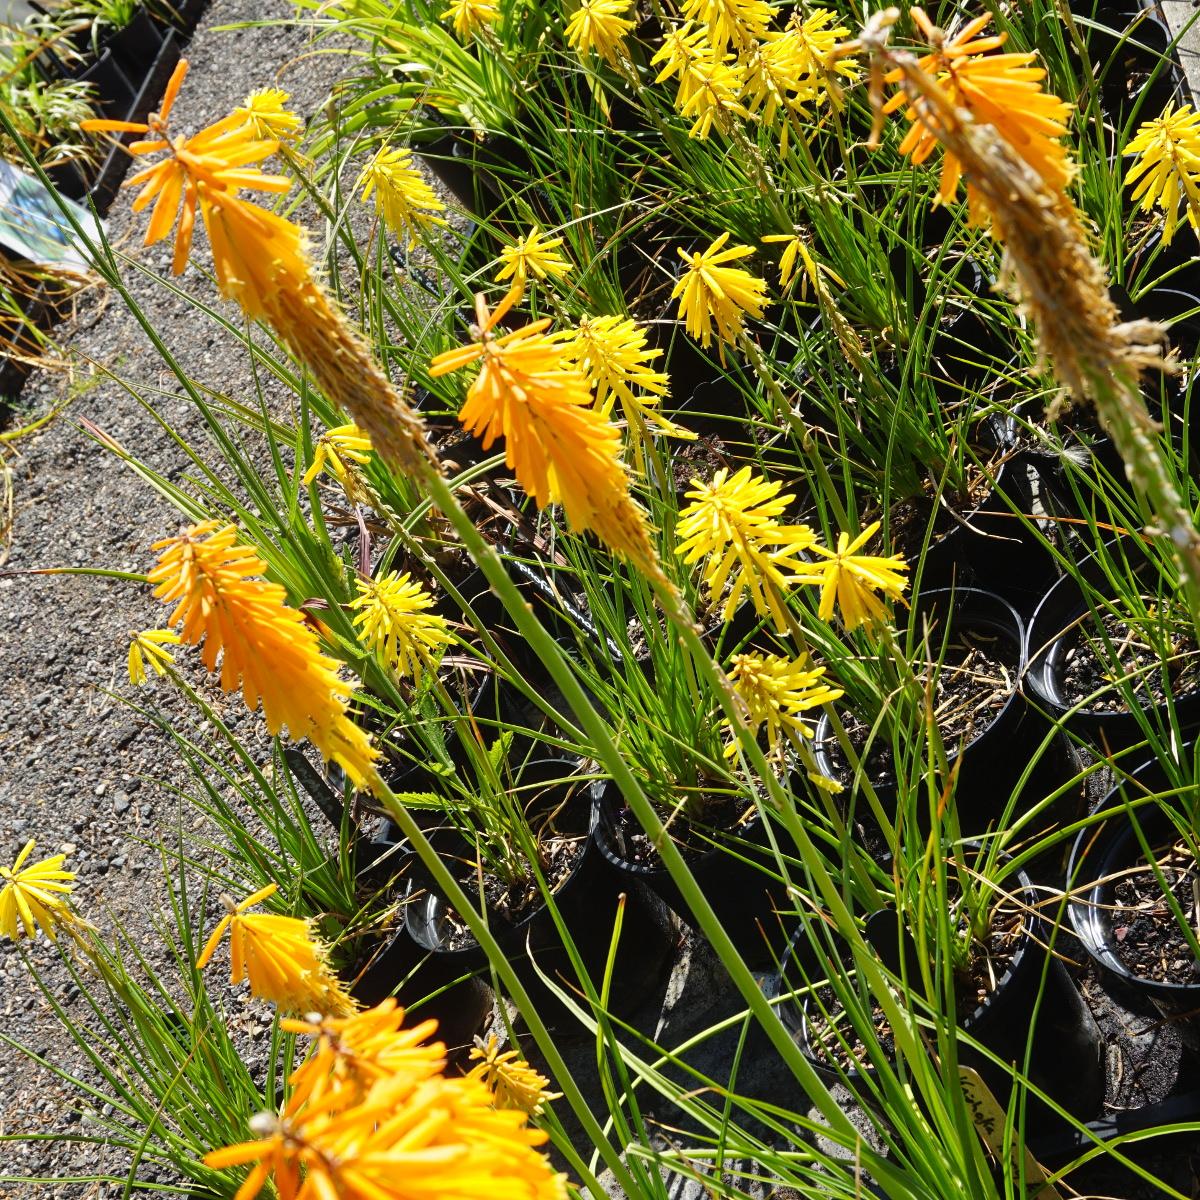 Kniphofia Red Hot Poker Bees Lemon 2 Litre Tall Pot 7 50 Enchanted Gardens Kent